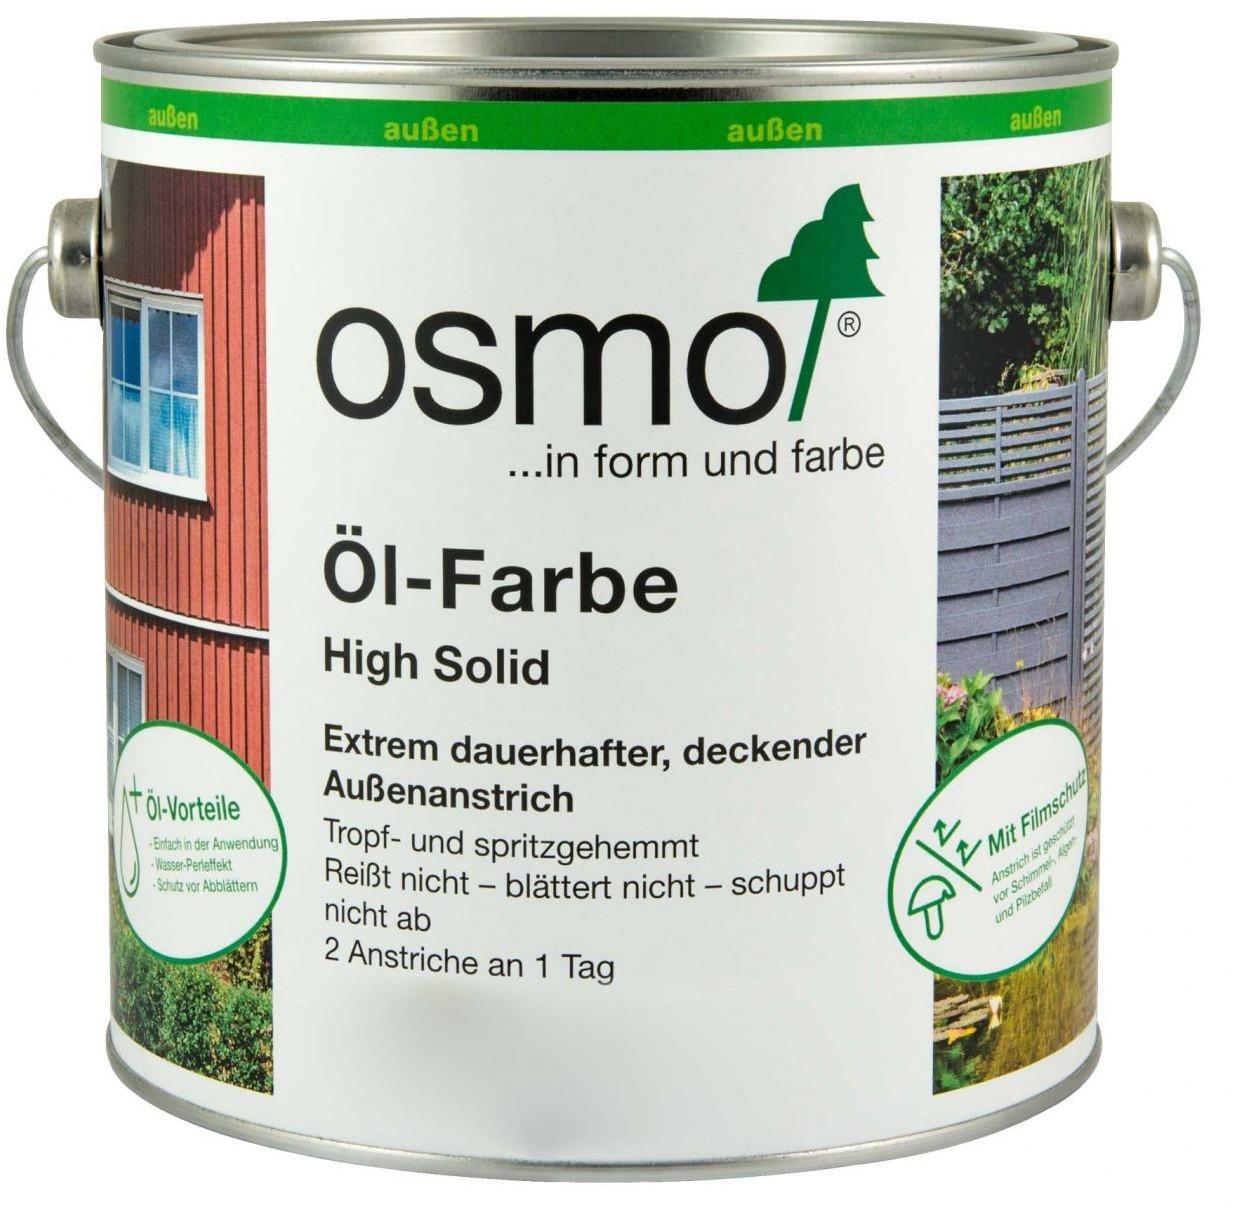 Osmo Öl-Farbe High Solid 5l Kieselgrau